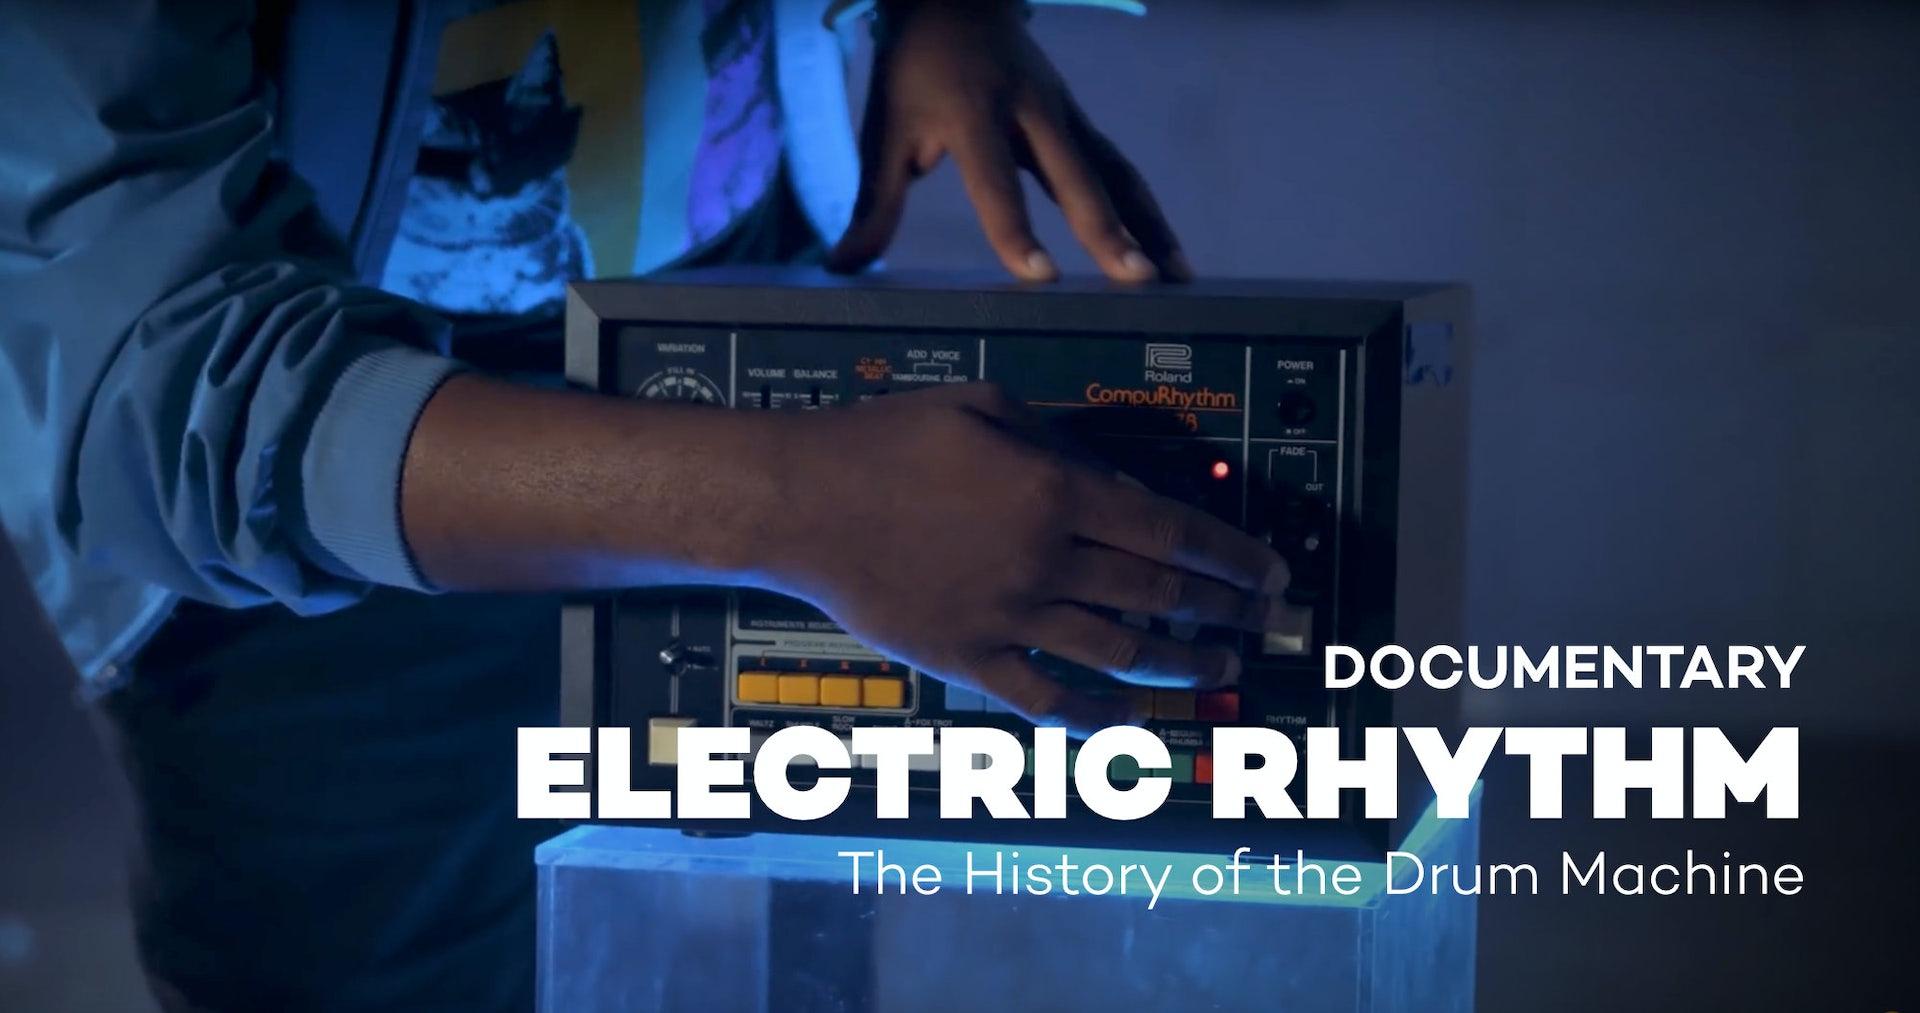 Documentary: The History of the Drum Machine